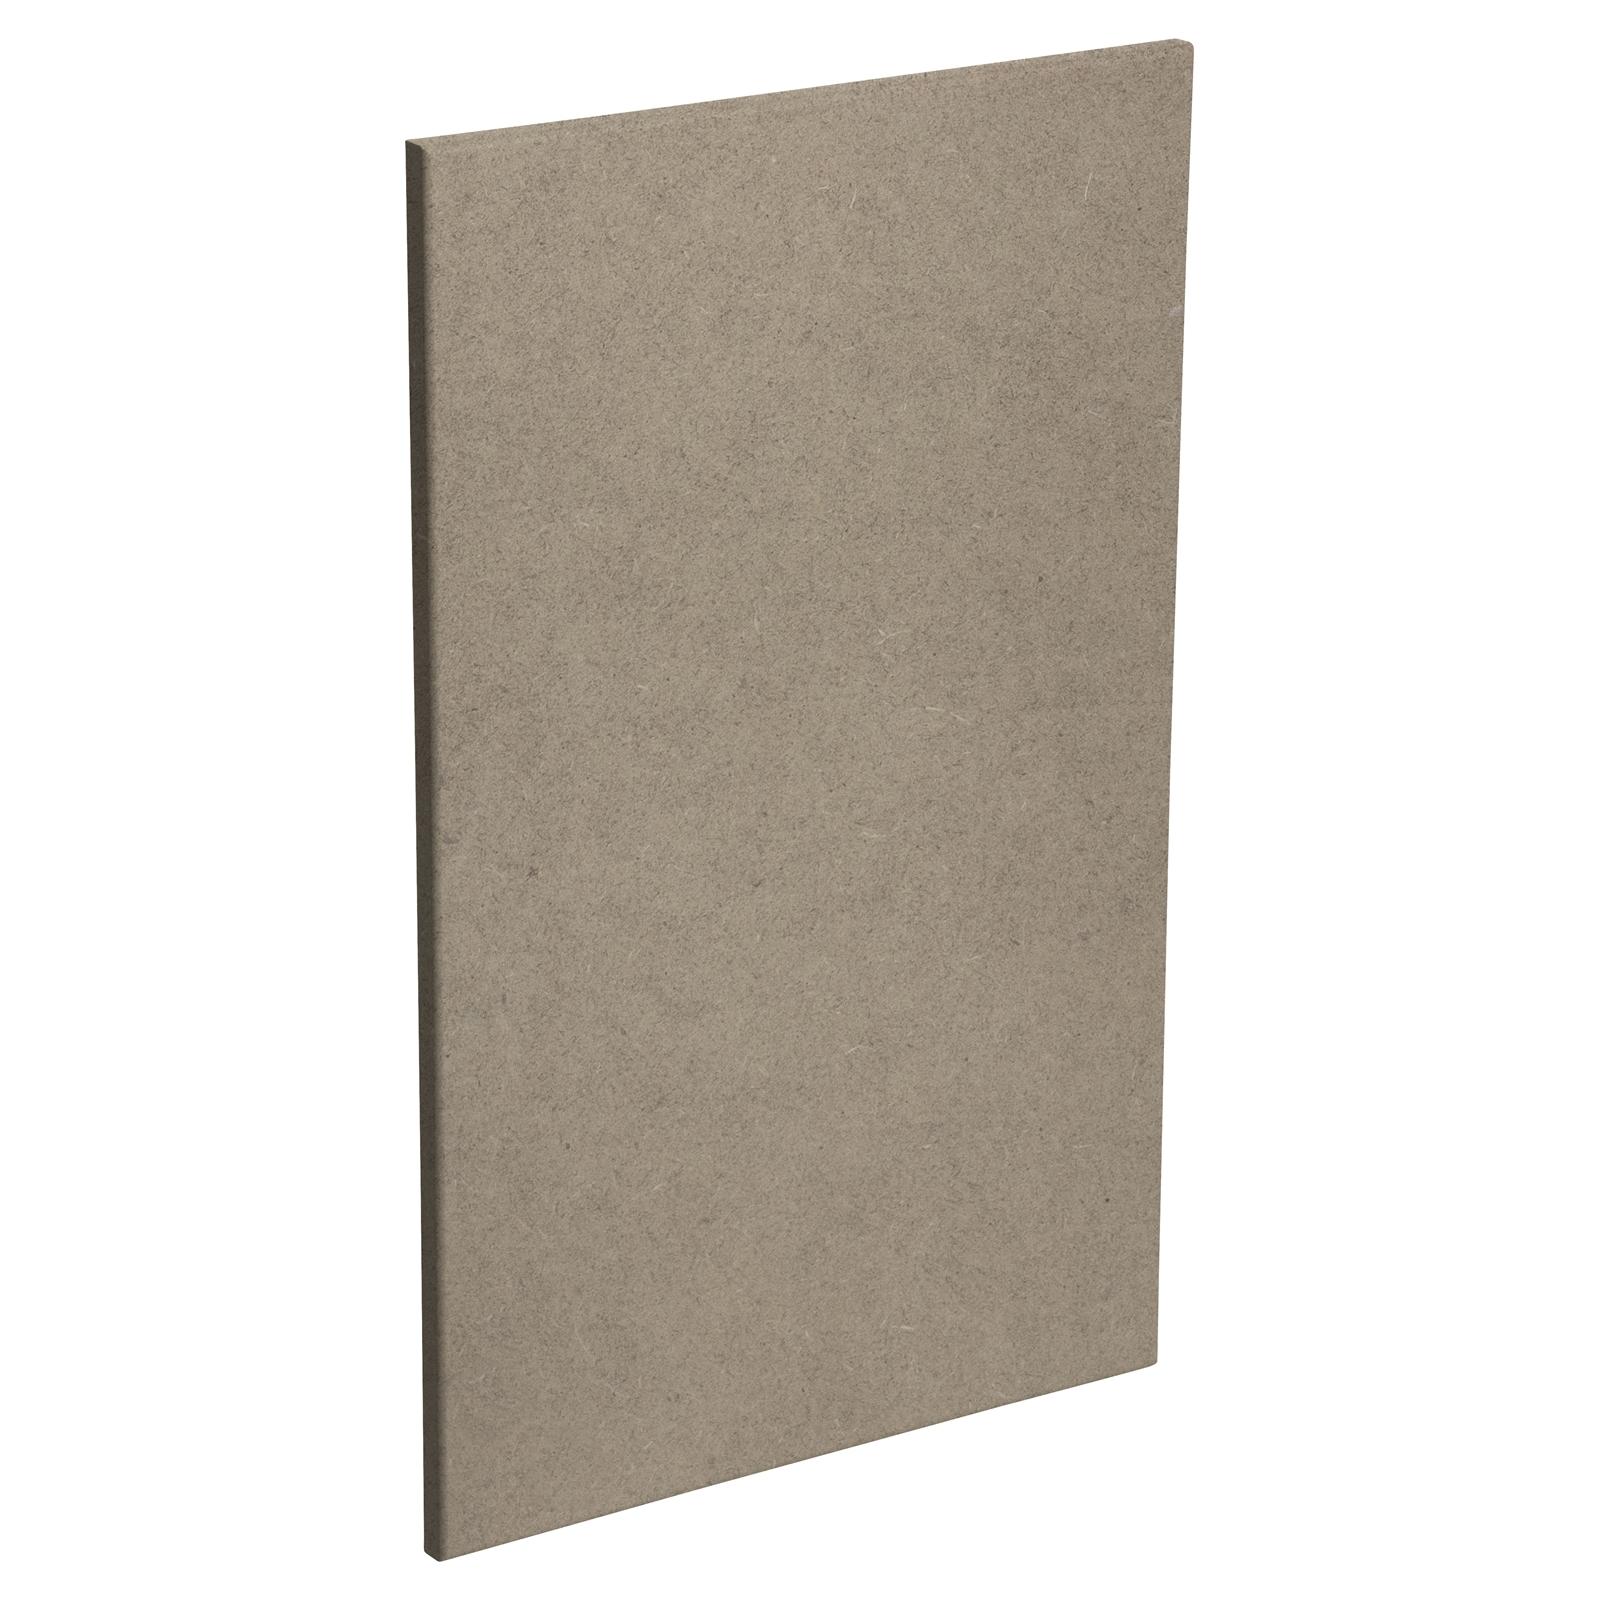 Kaboodle 450mm Raw Board Modern Cabinet Door